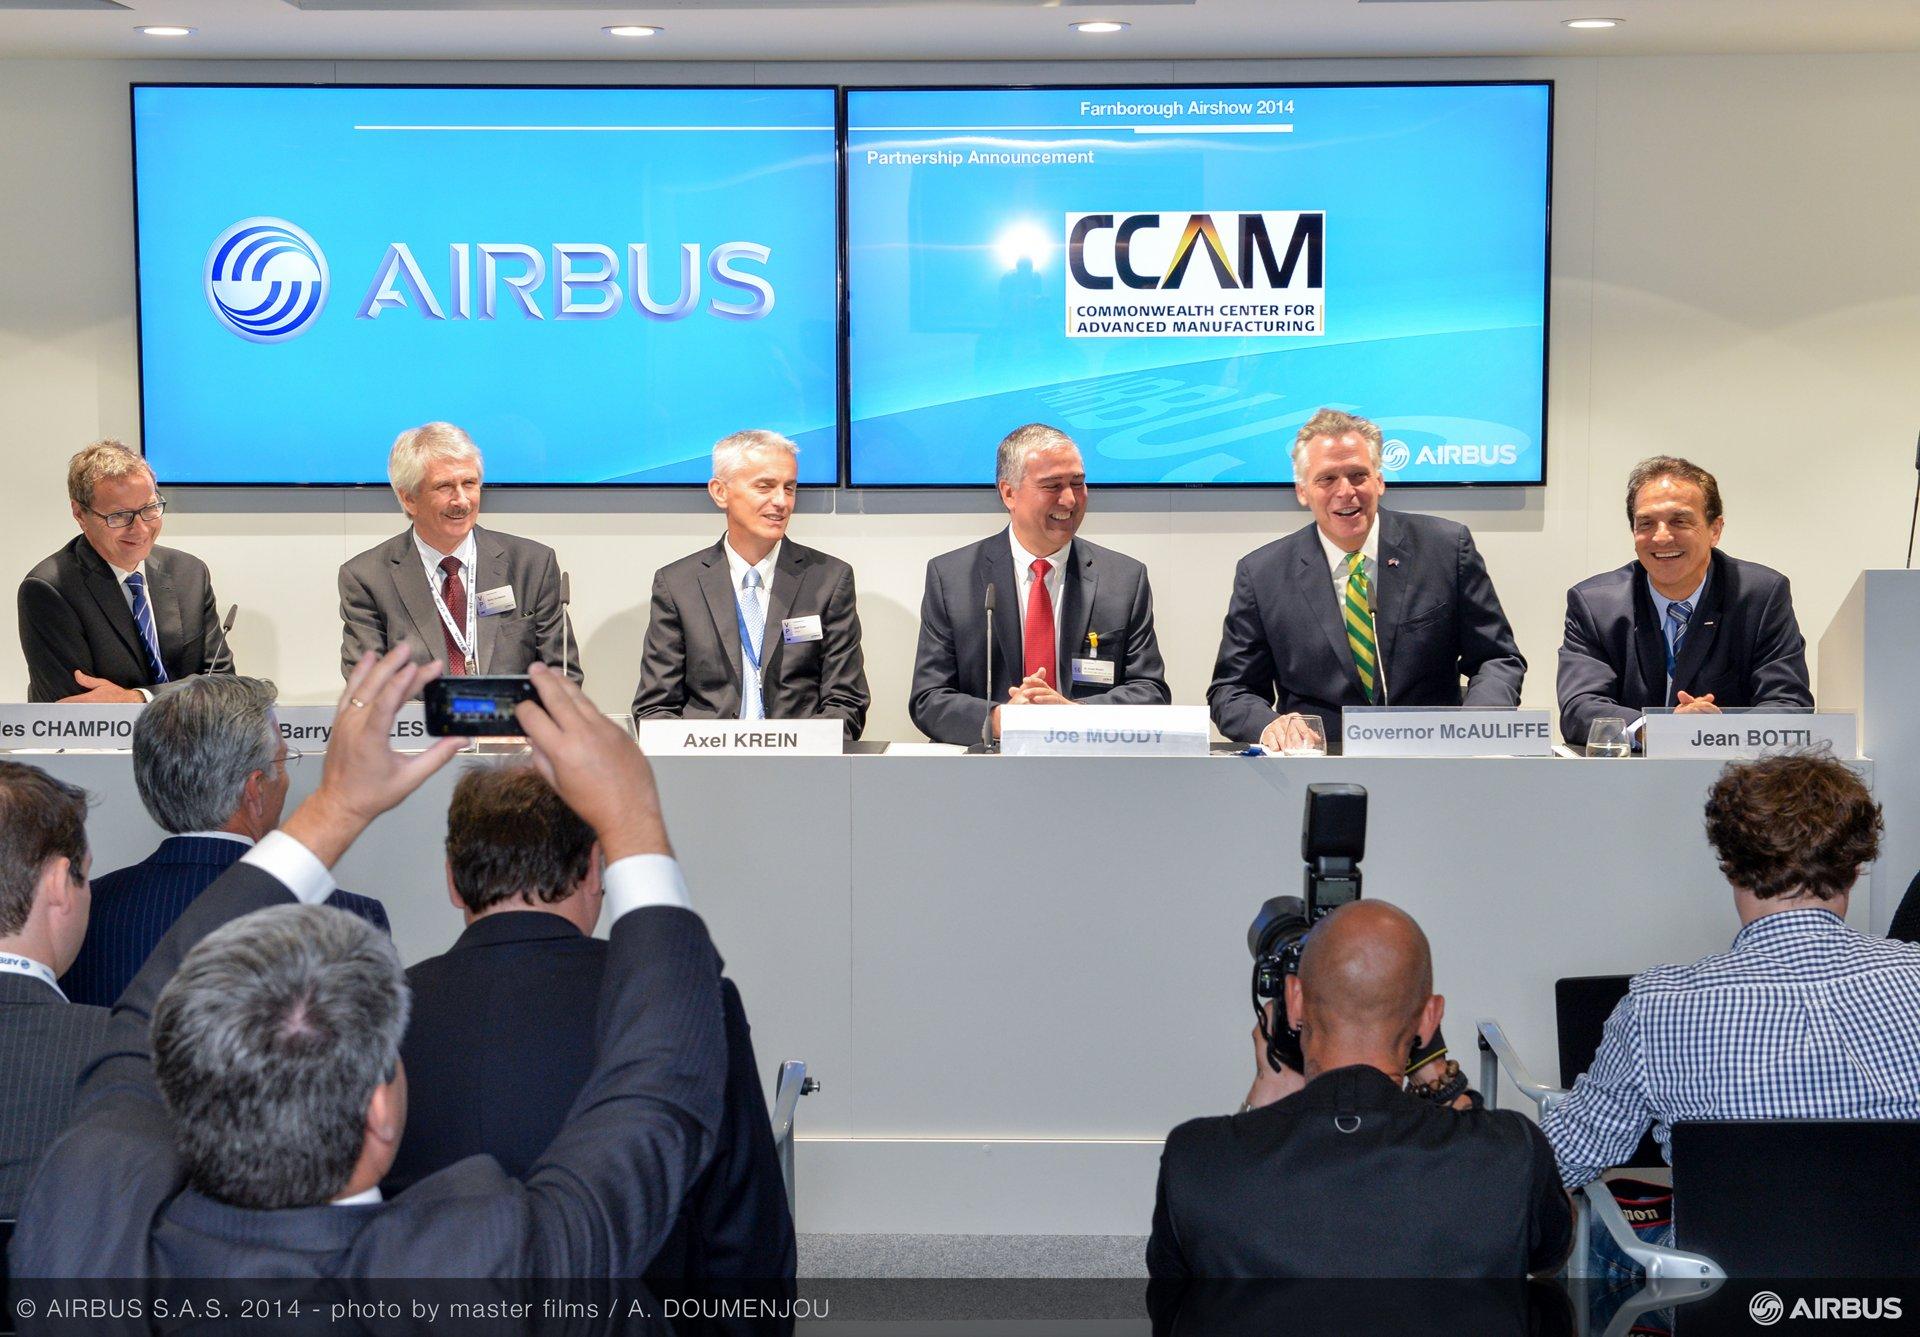 CCAM partnership announcement 2